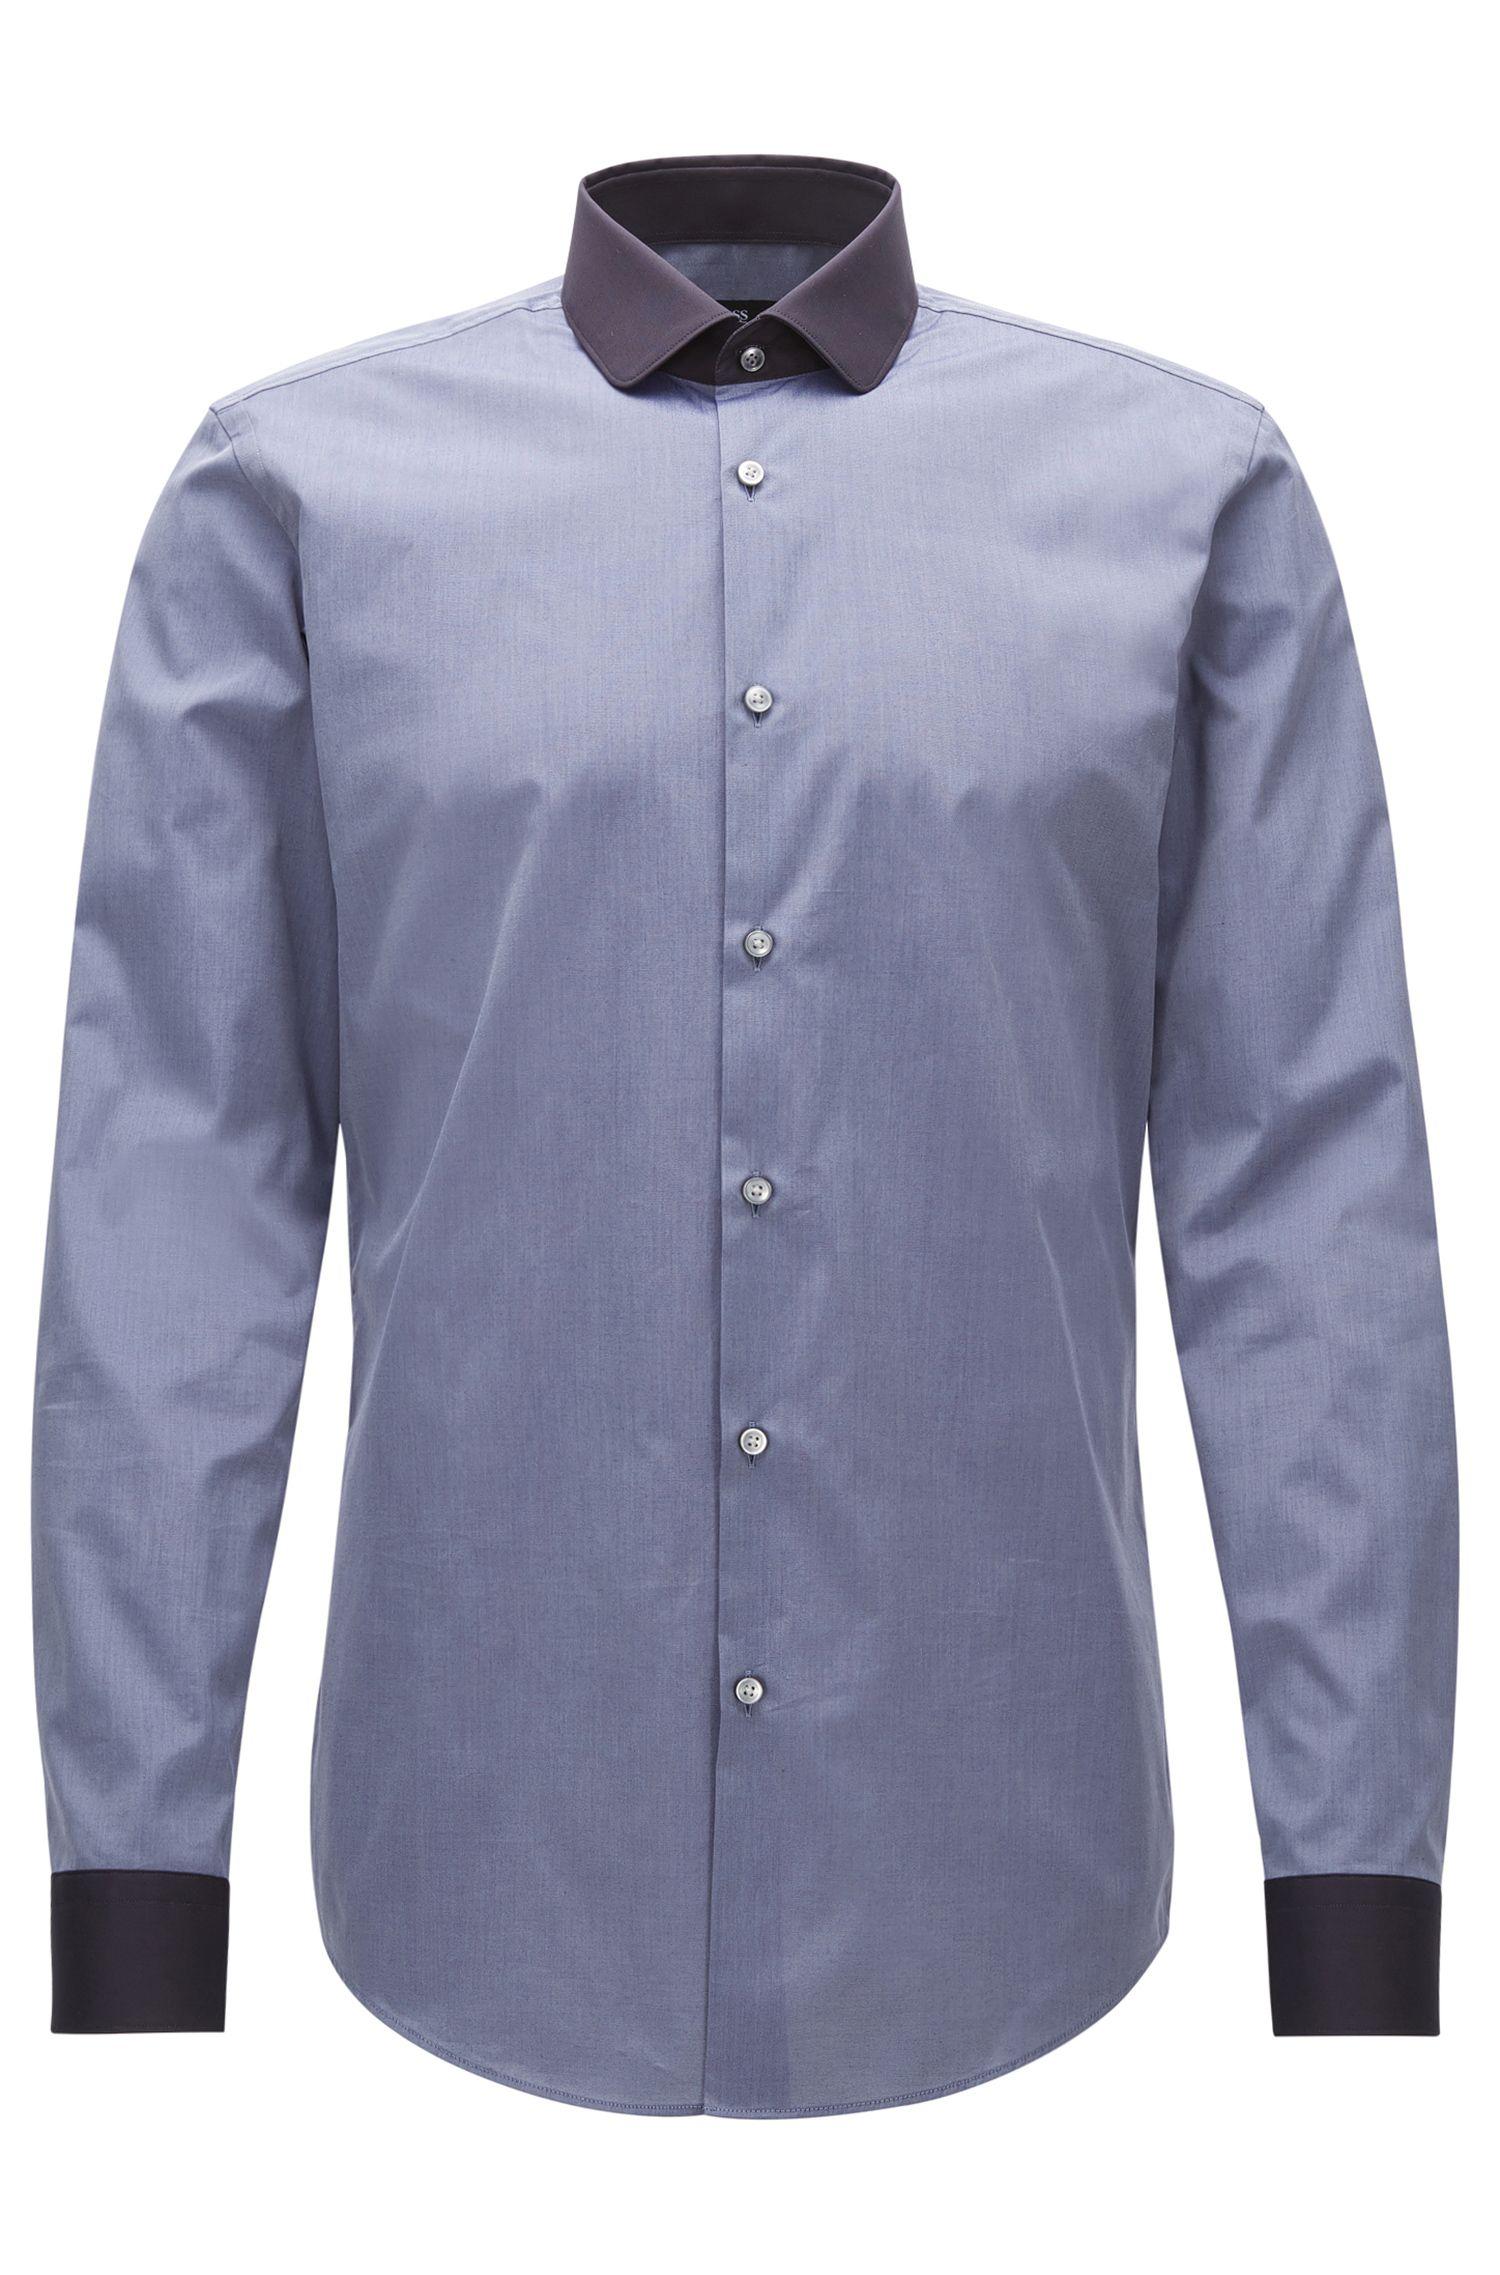 Contrast Easy Iron Cotton Dress Shirt, Slim Fit   Joshy